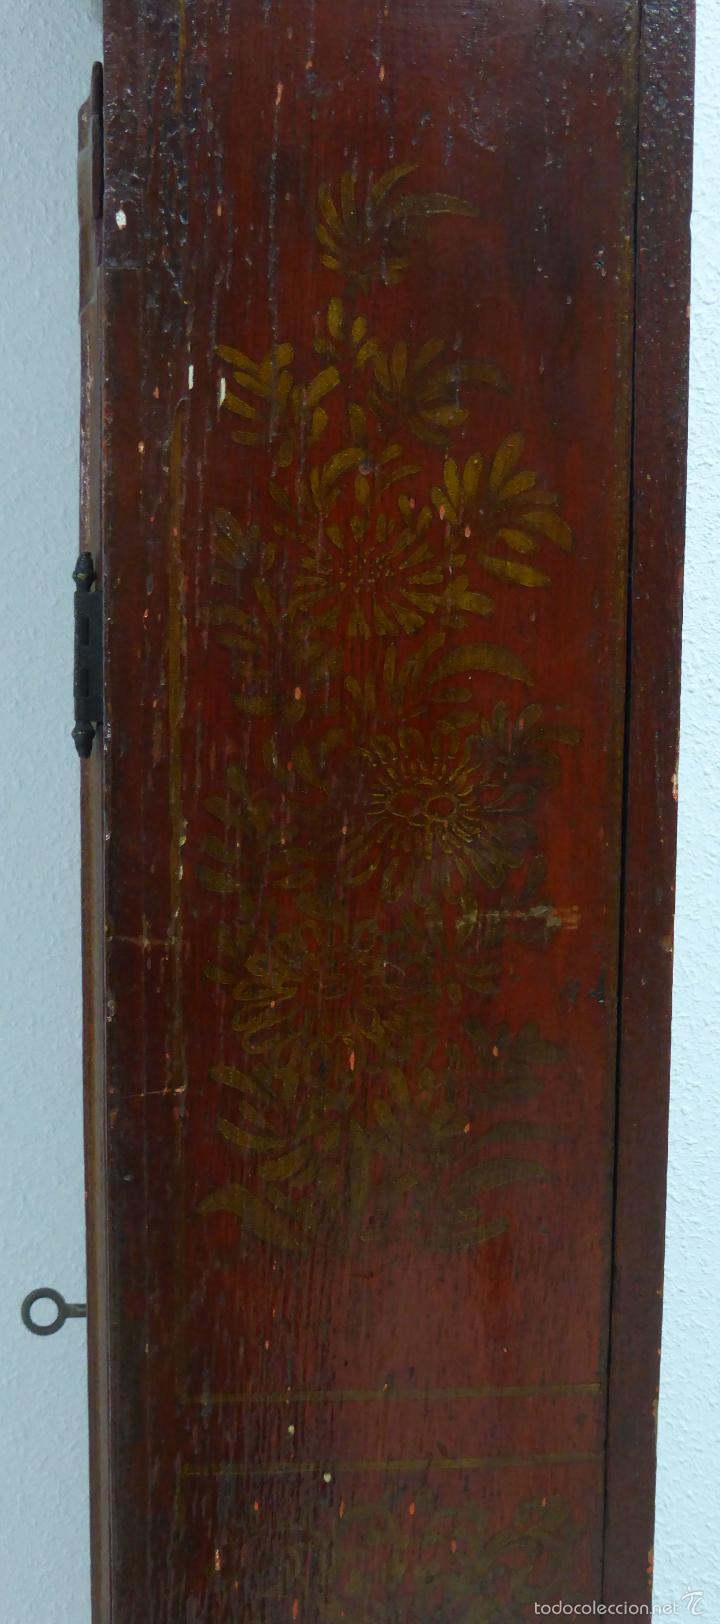 Relojes de pie: Reloj pie inglés laca japanning chinoseries S XVIII Maquinaria William Fidgett London Funciona - Foto 25 - 58294331